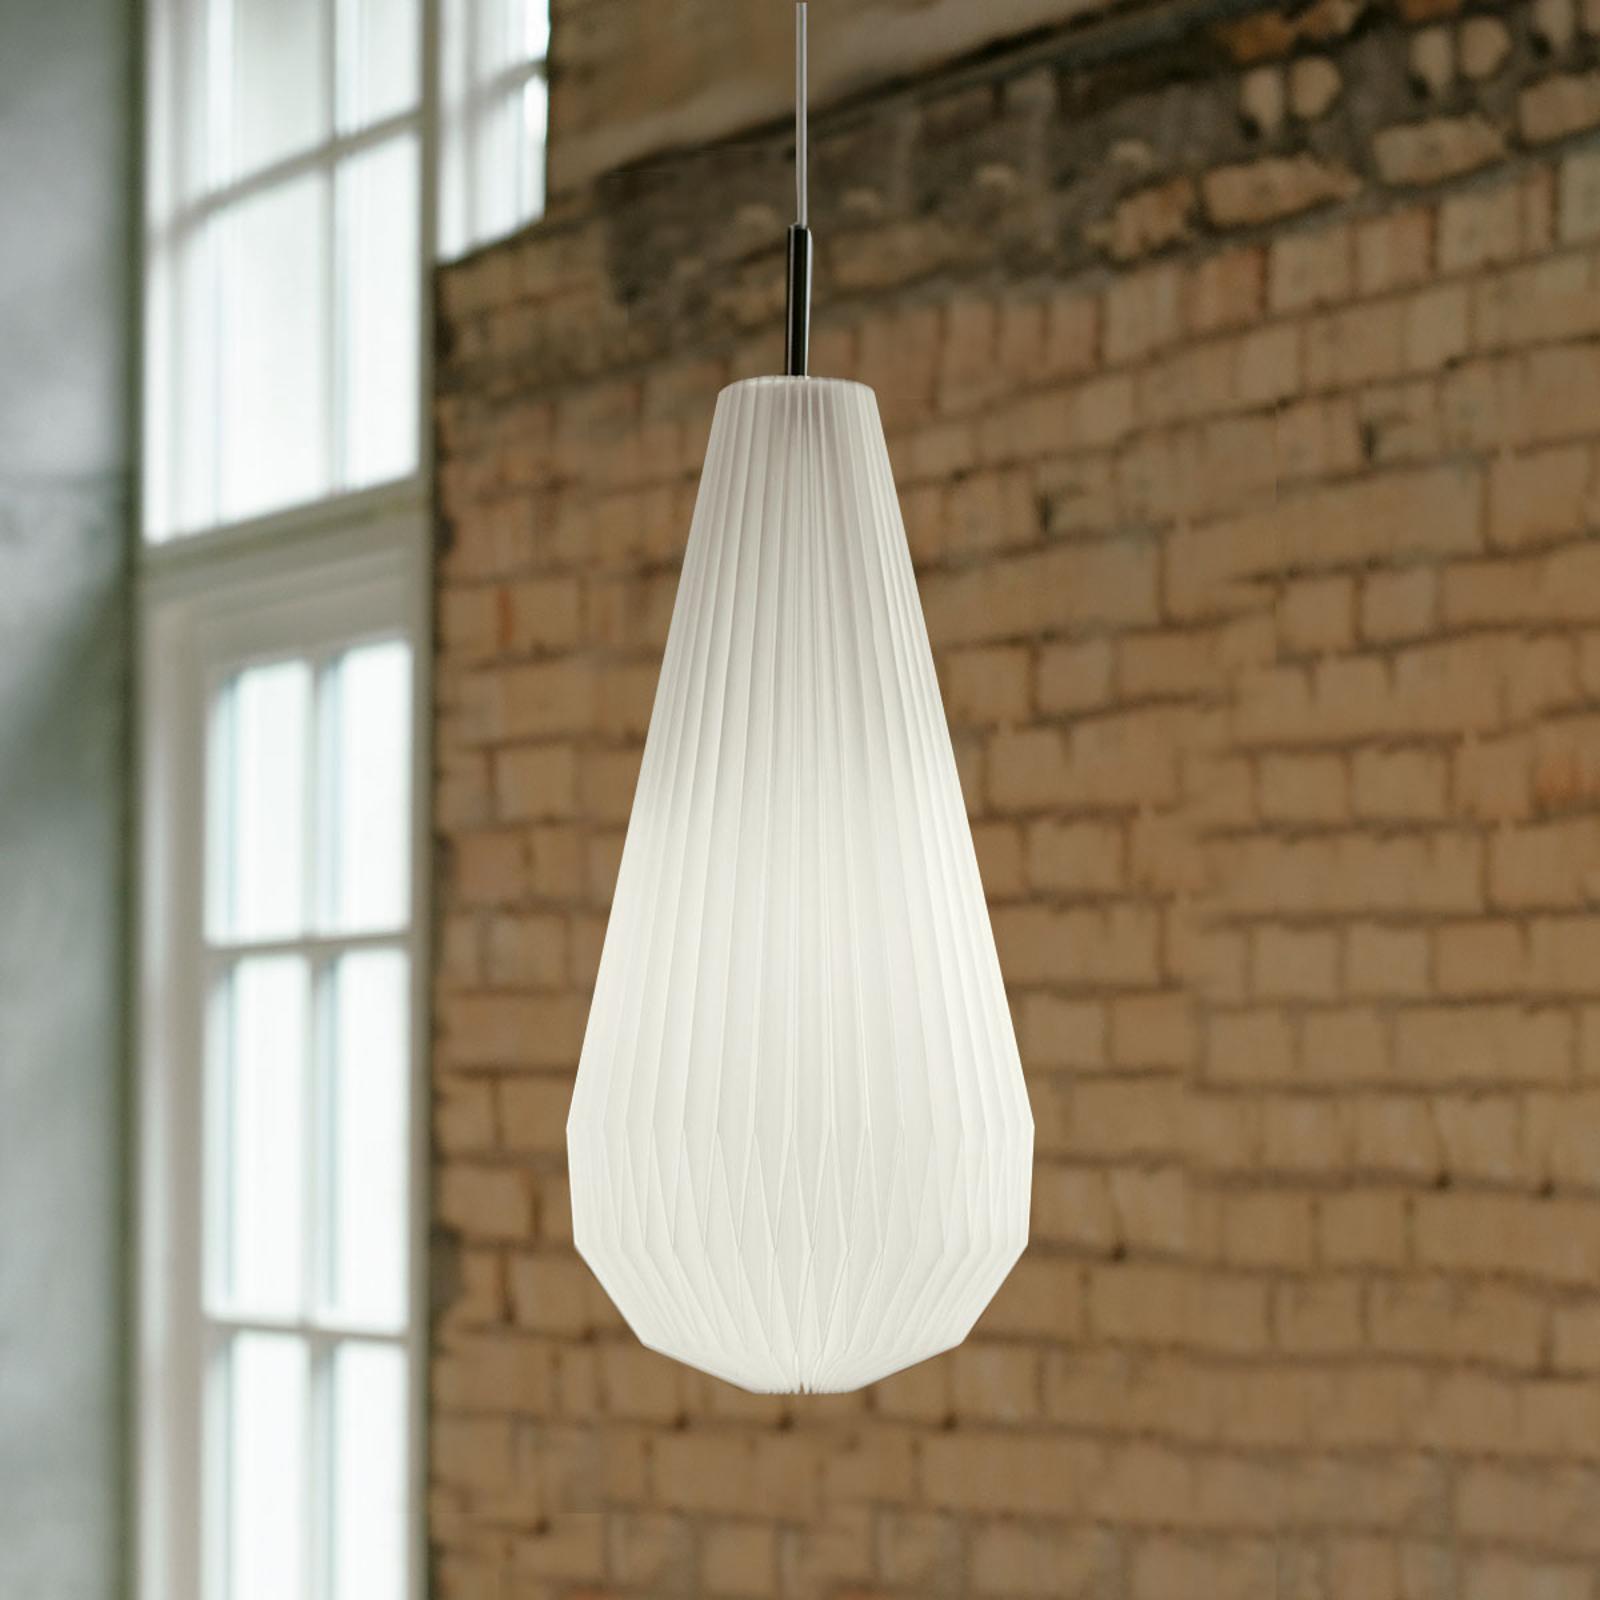 LE KLINT Comet - designerska lampa wisząca, 20 cm